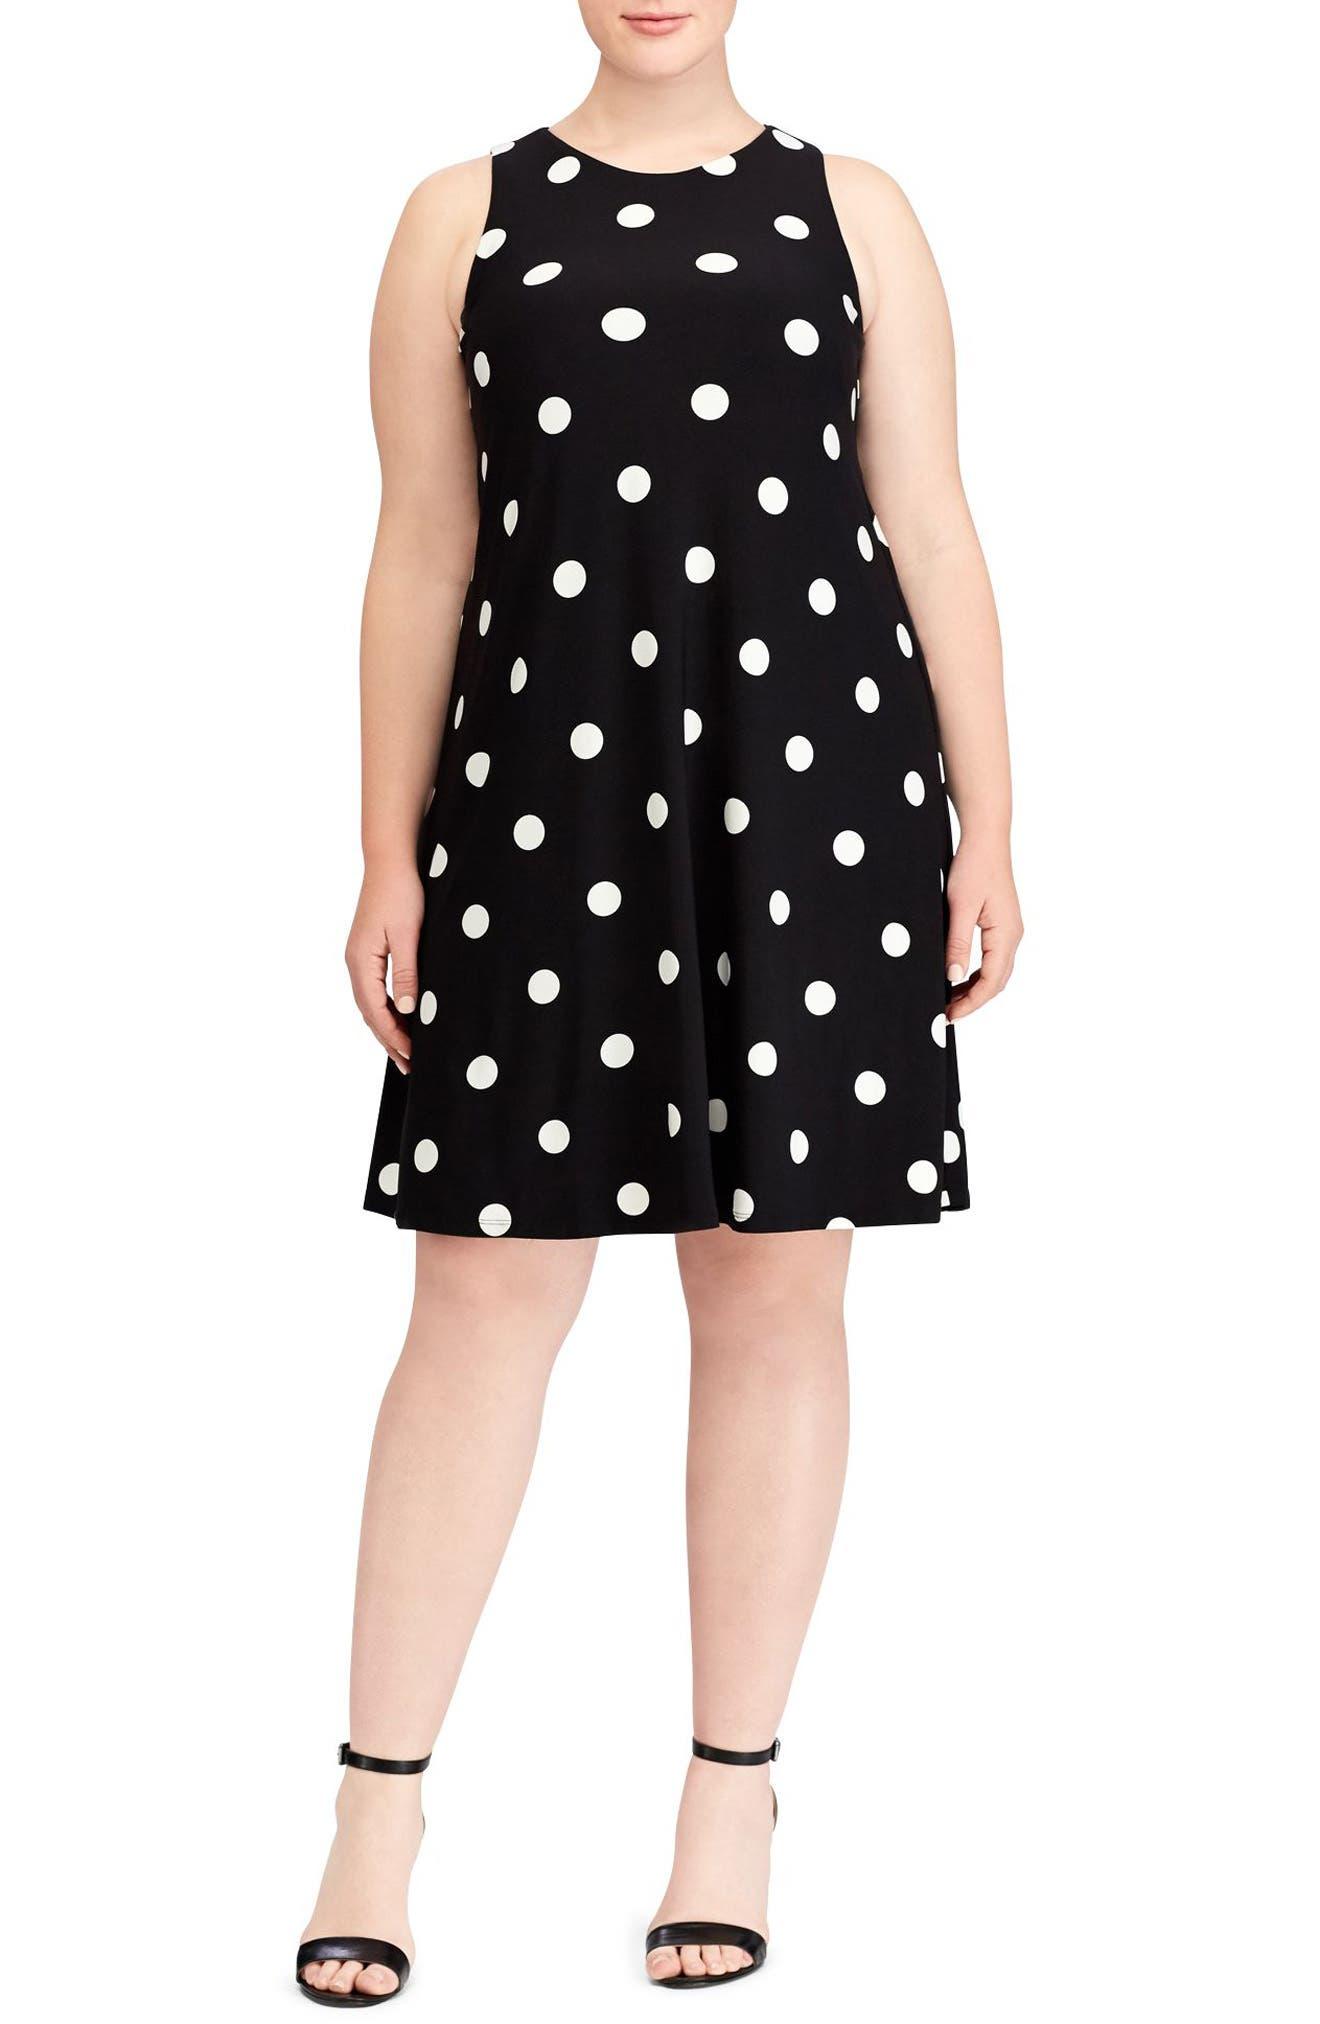 Suzan Peninsula Dot Shift Dress,                             Main thumbnail 1, color,                             Black-Colonial Cream